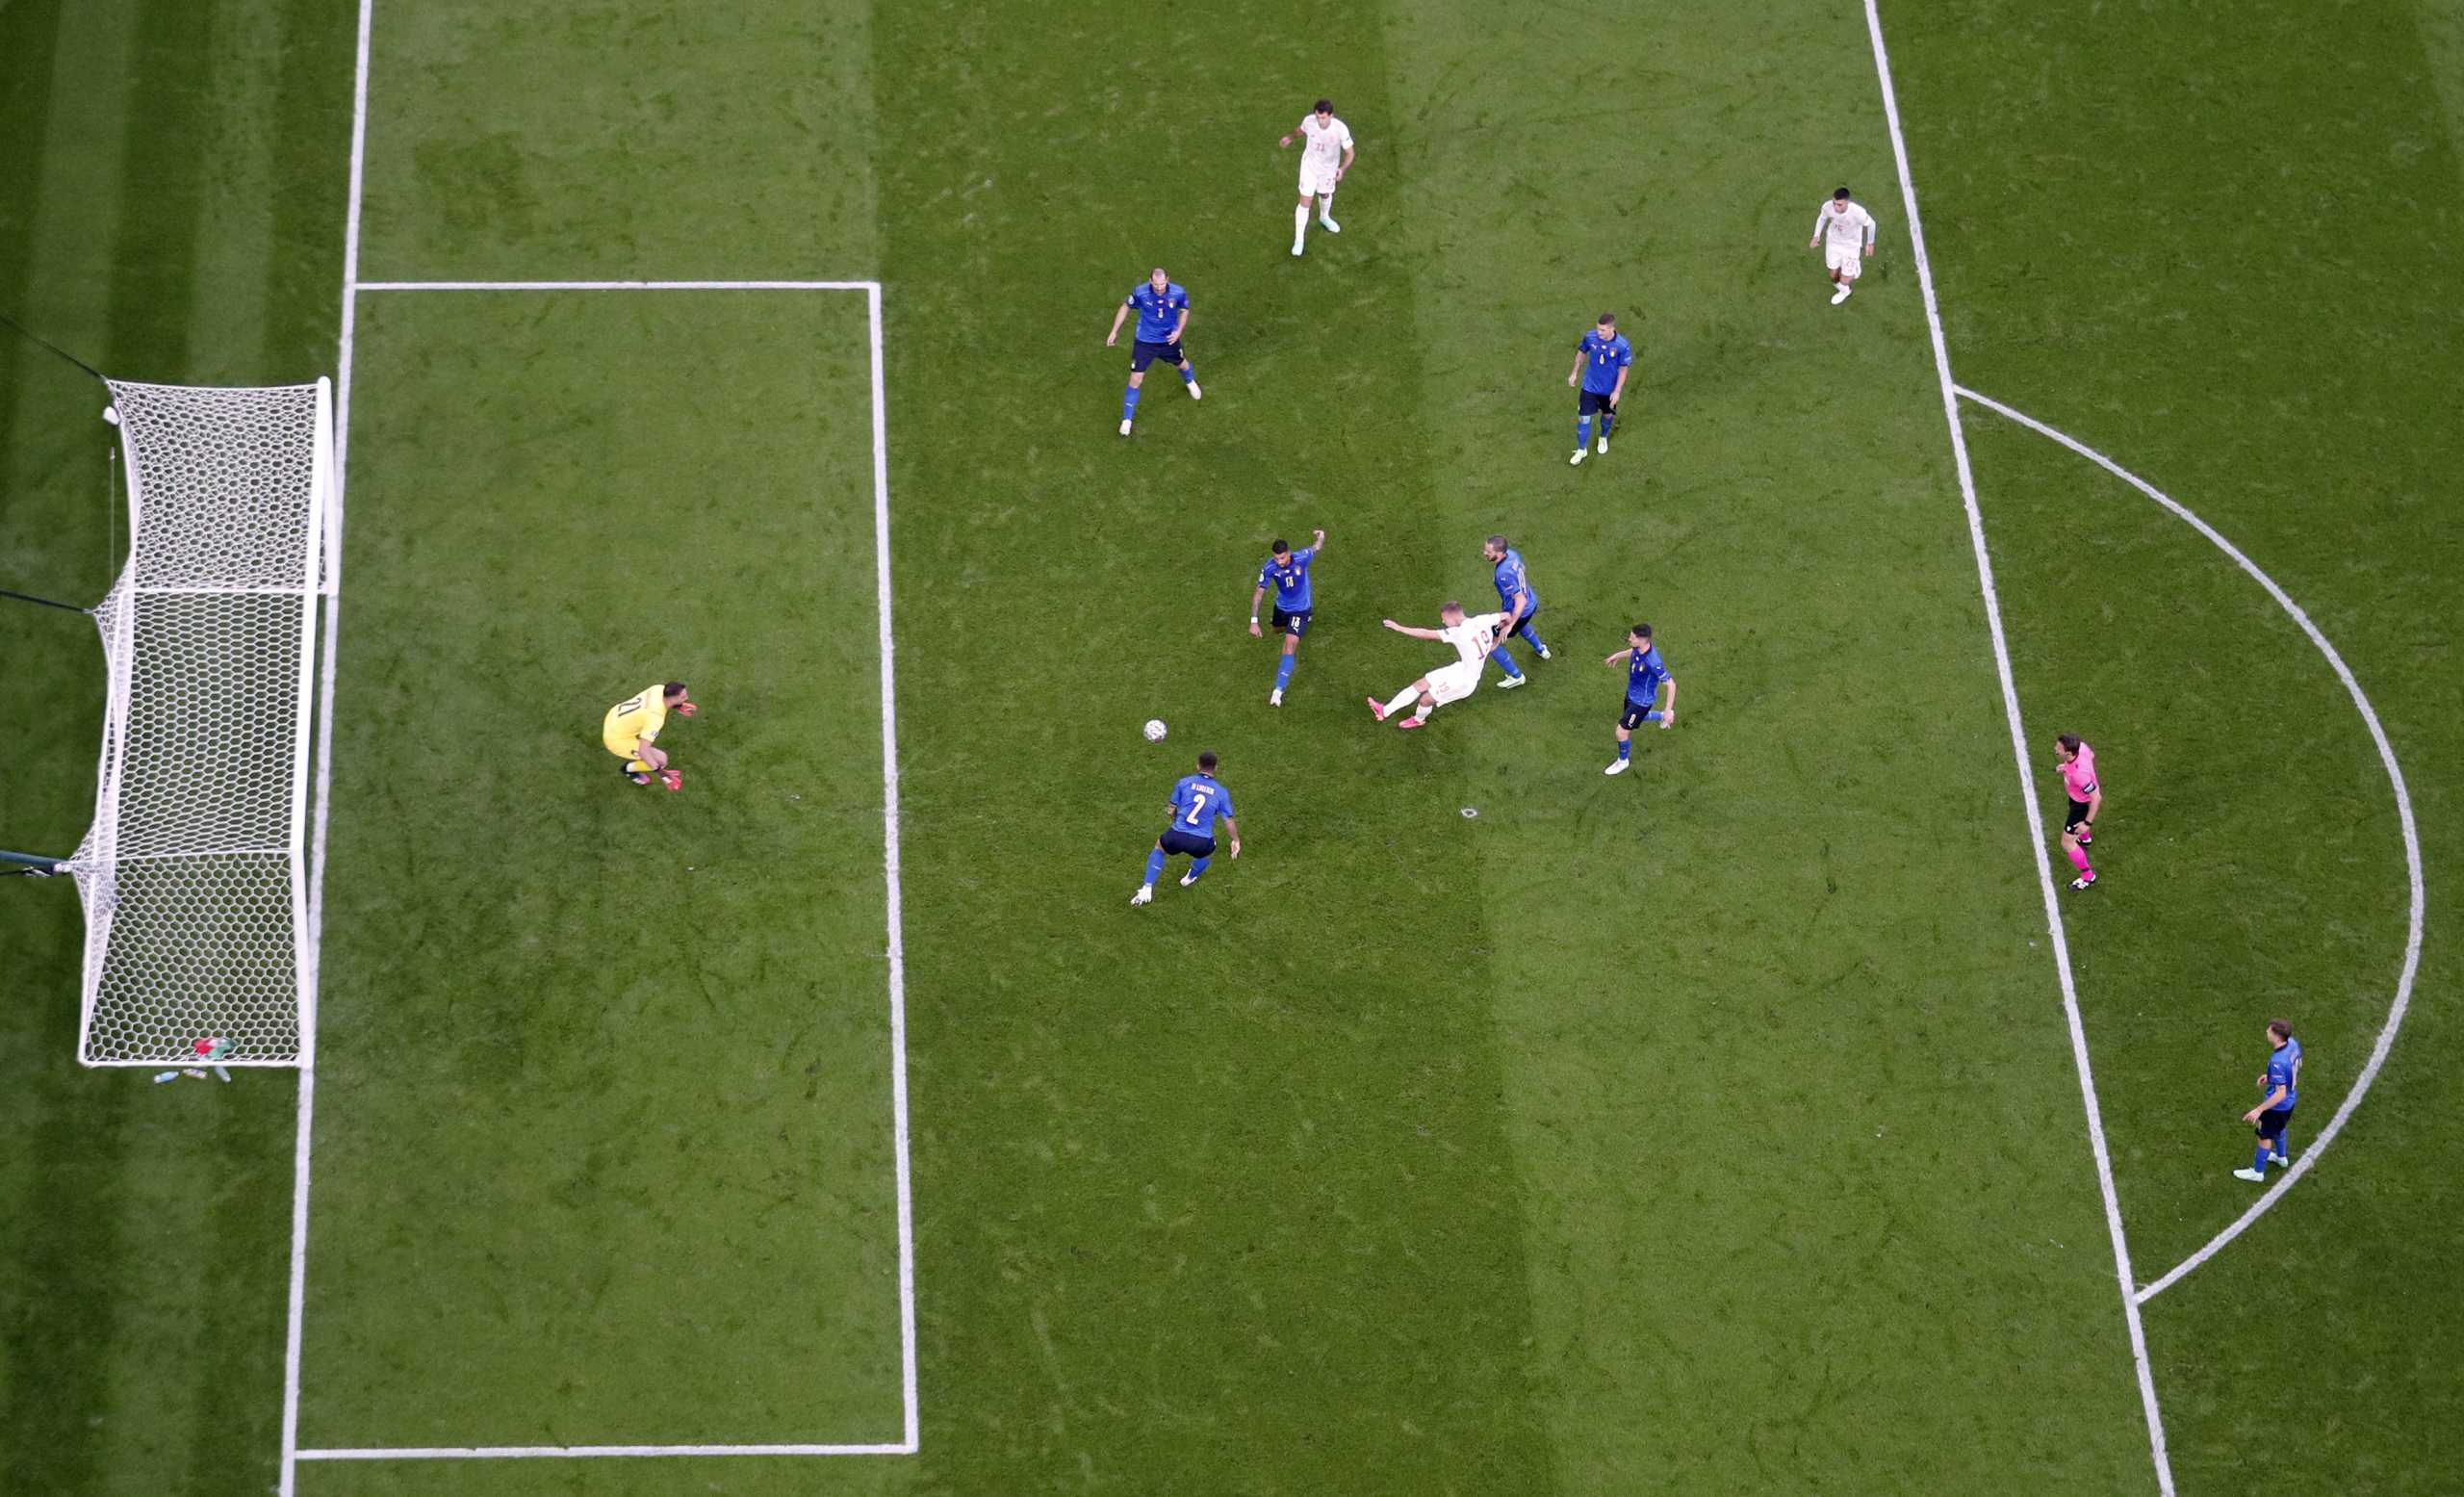 Euro 2020, Ιταλία – Ισπανία: Η μεγάλη επέμβαση του Ντοναρούμα